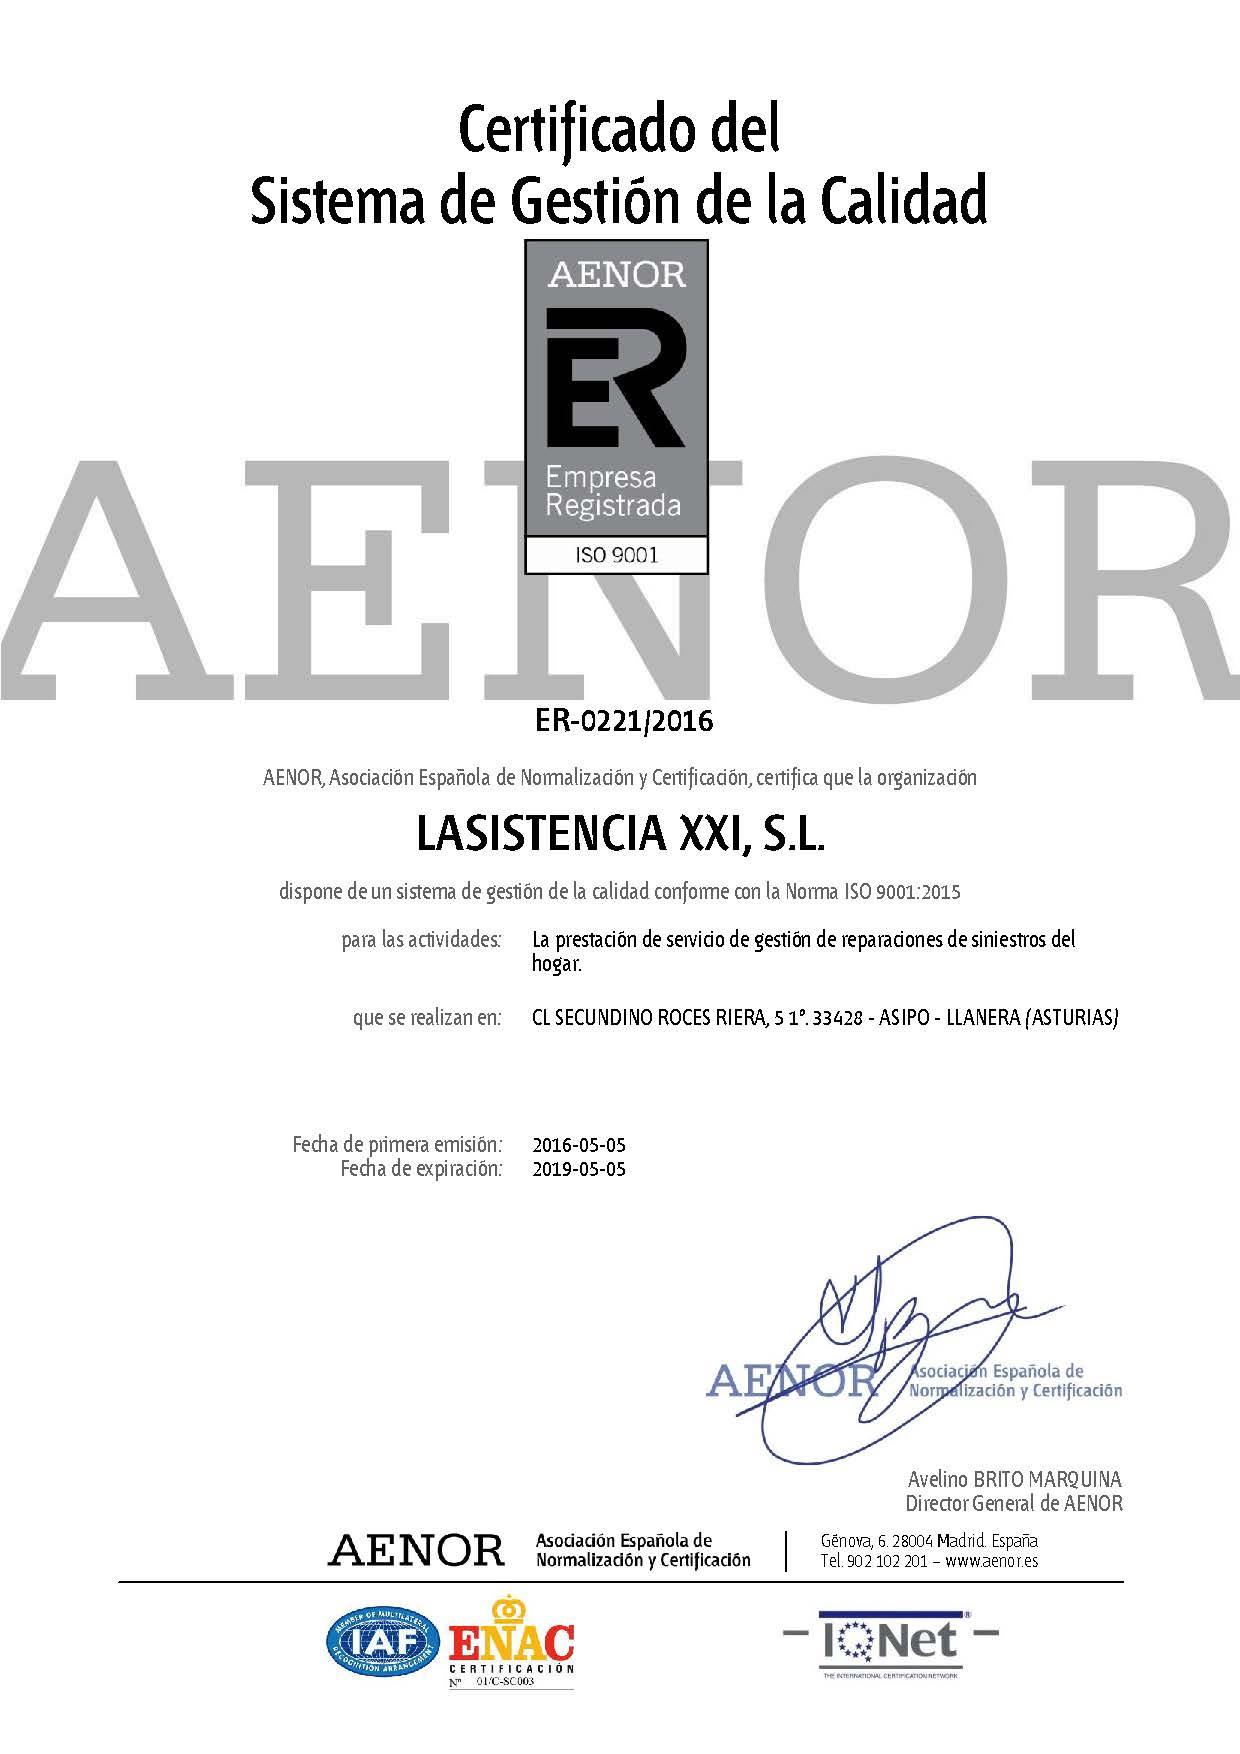 CertificadoER-0221-2016_ES_2016-05-05